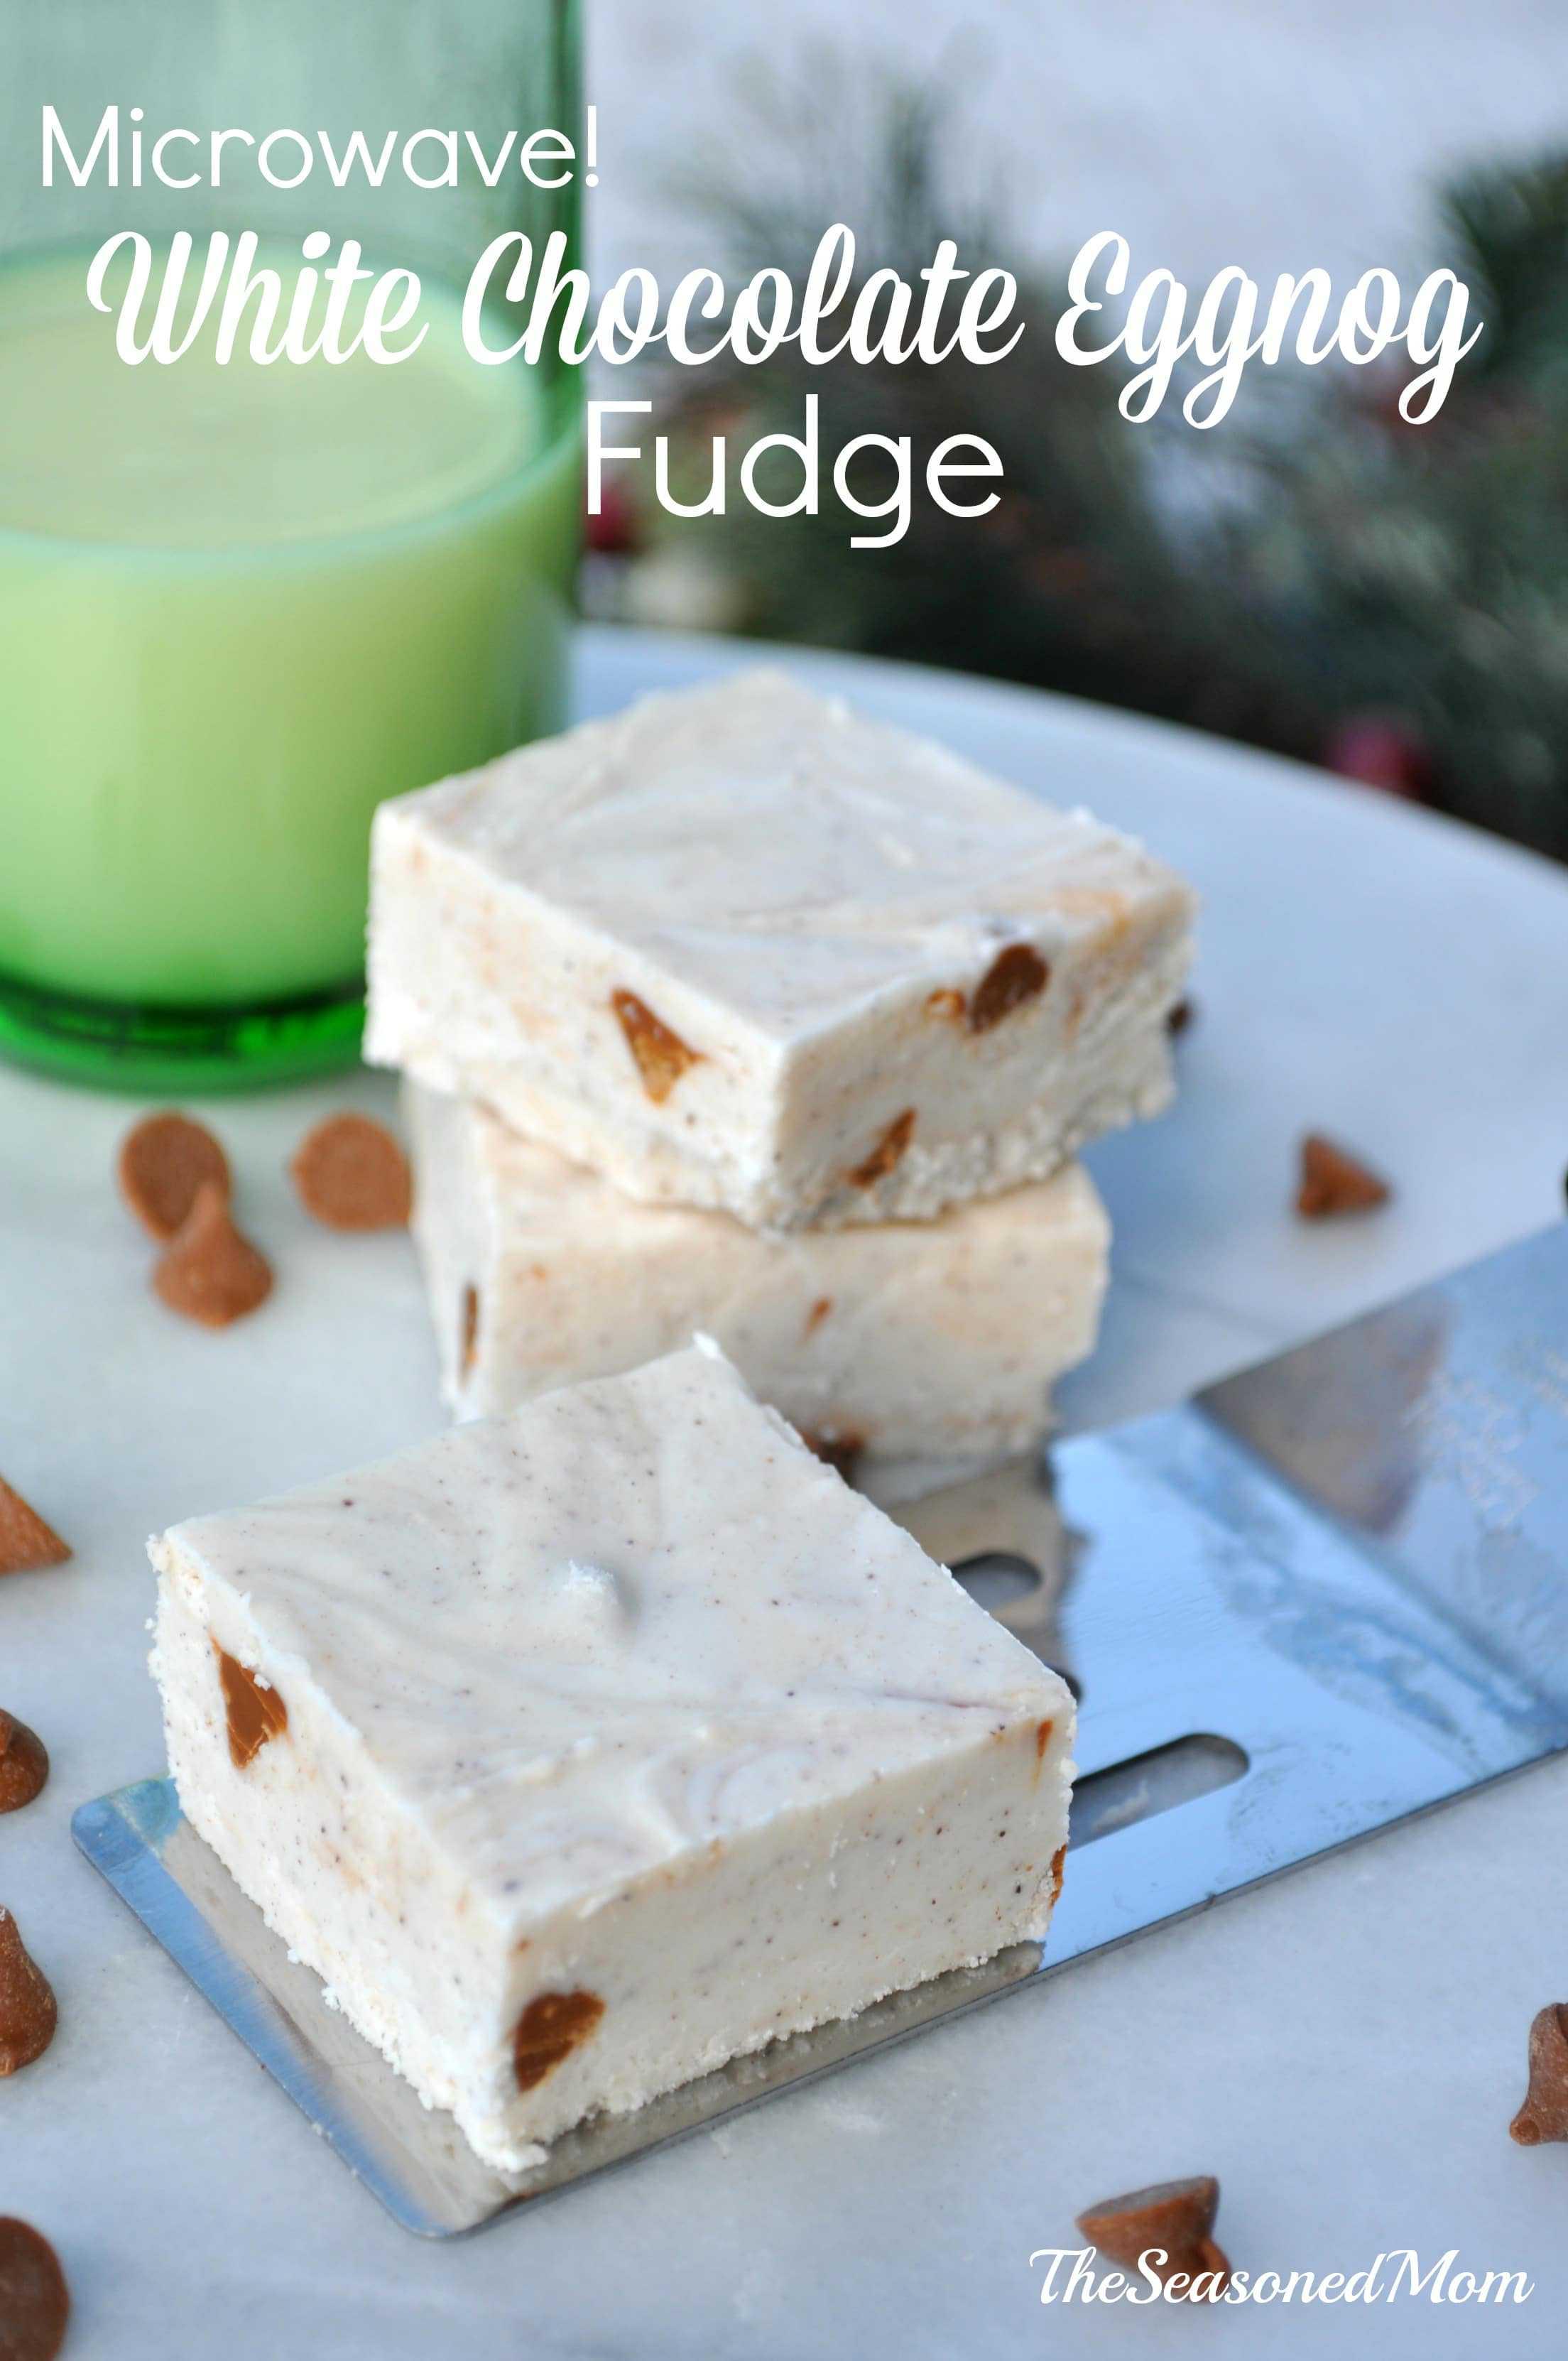 {Microwave} White Chocolate Eggnog Fudge - The Seasoned Mom